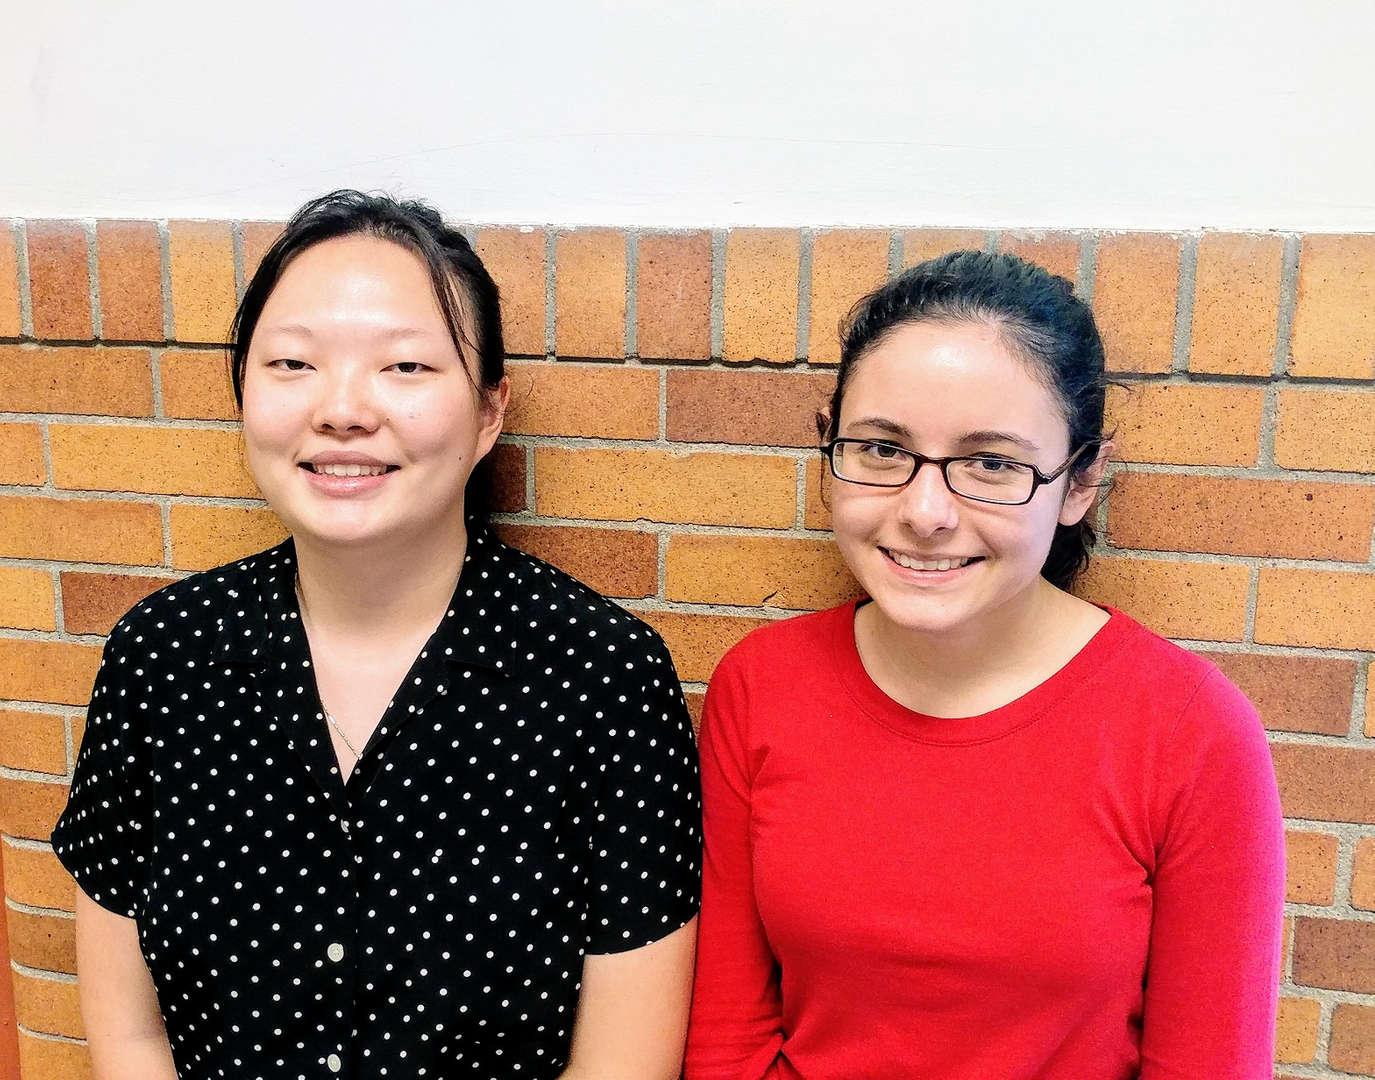 Students Joy Won and Claire McMahon